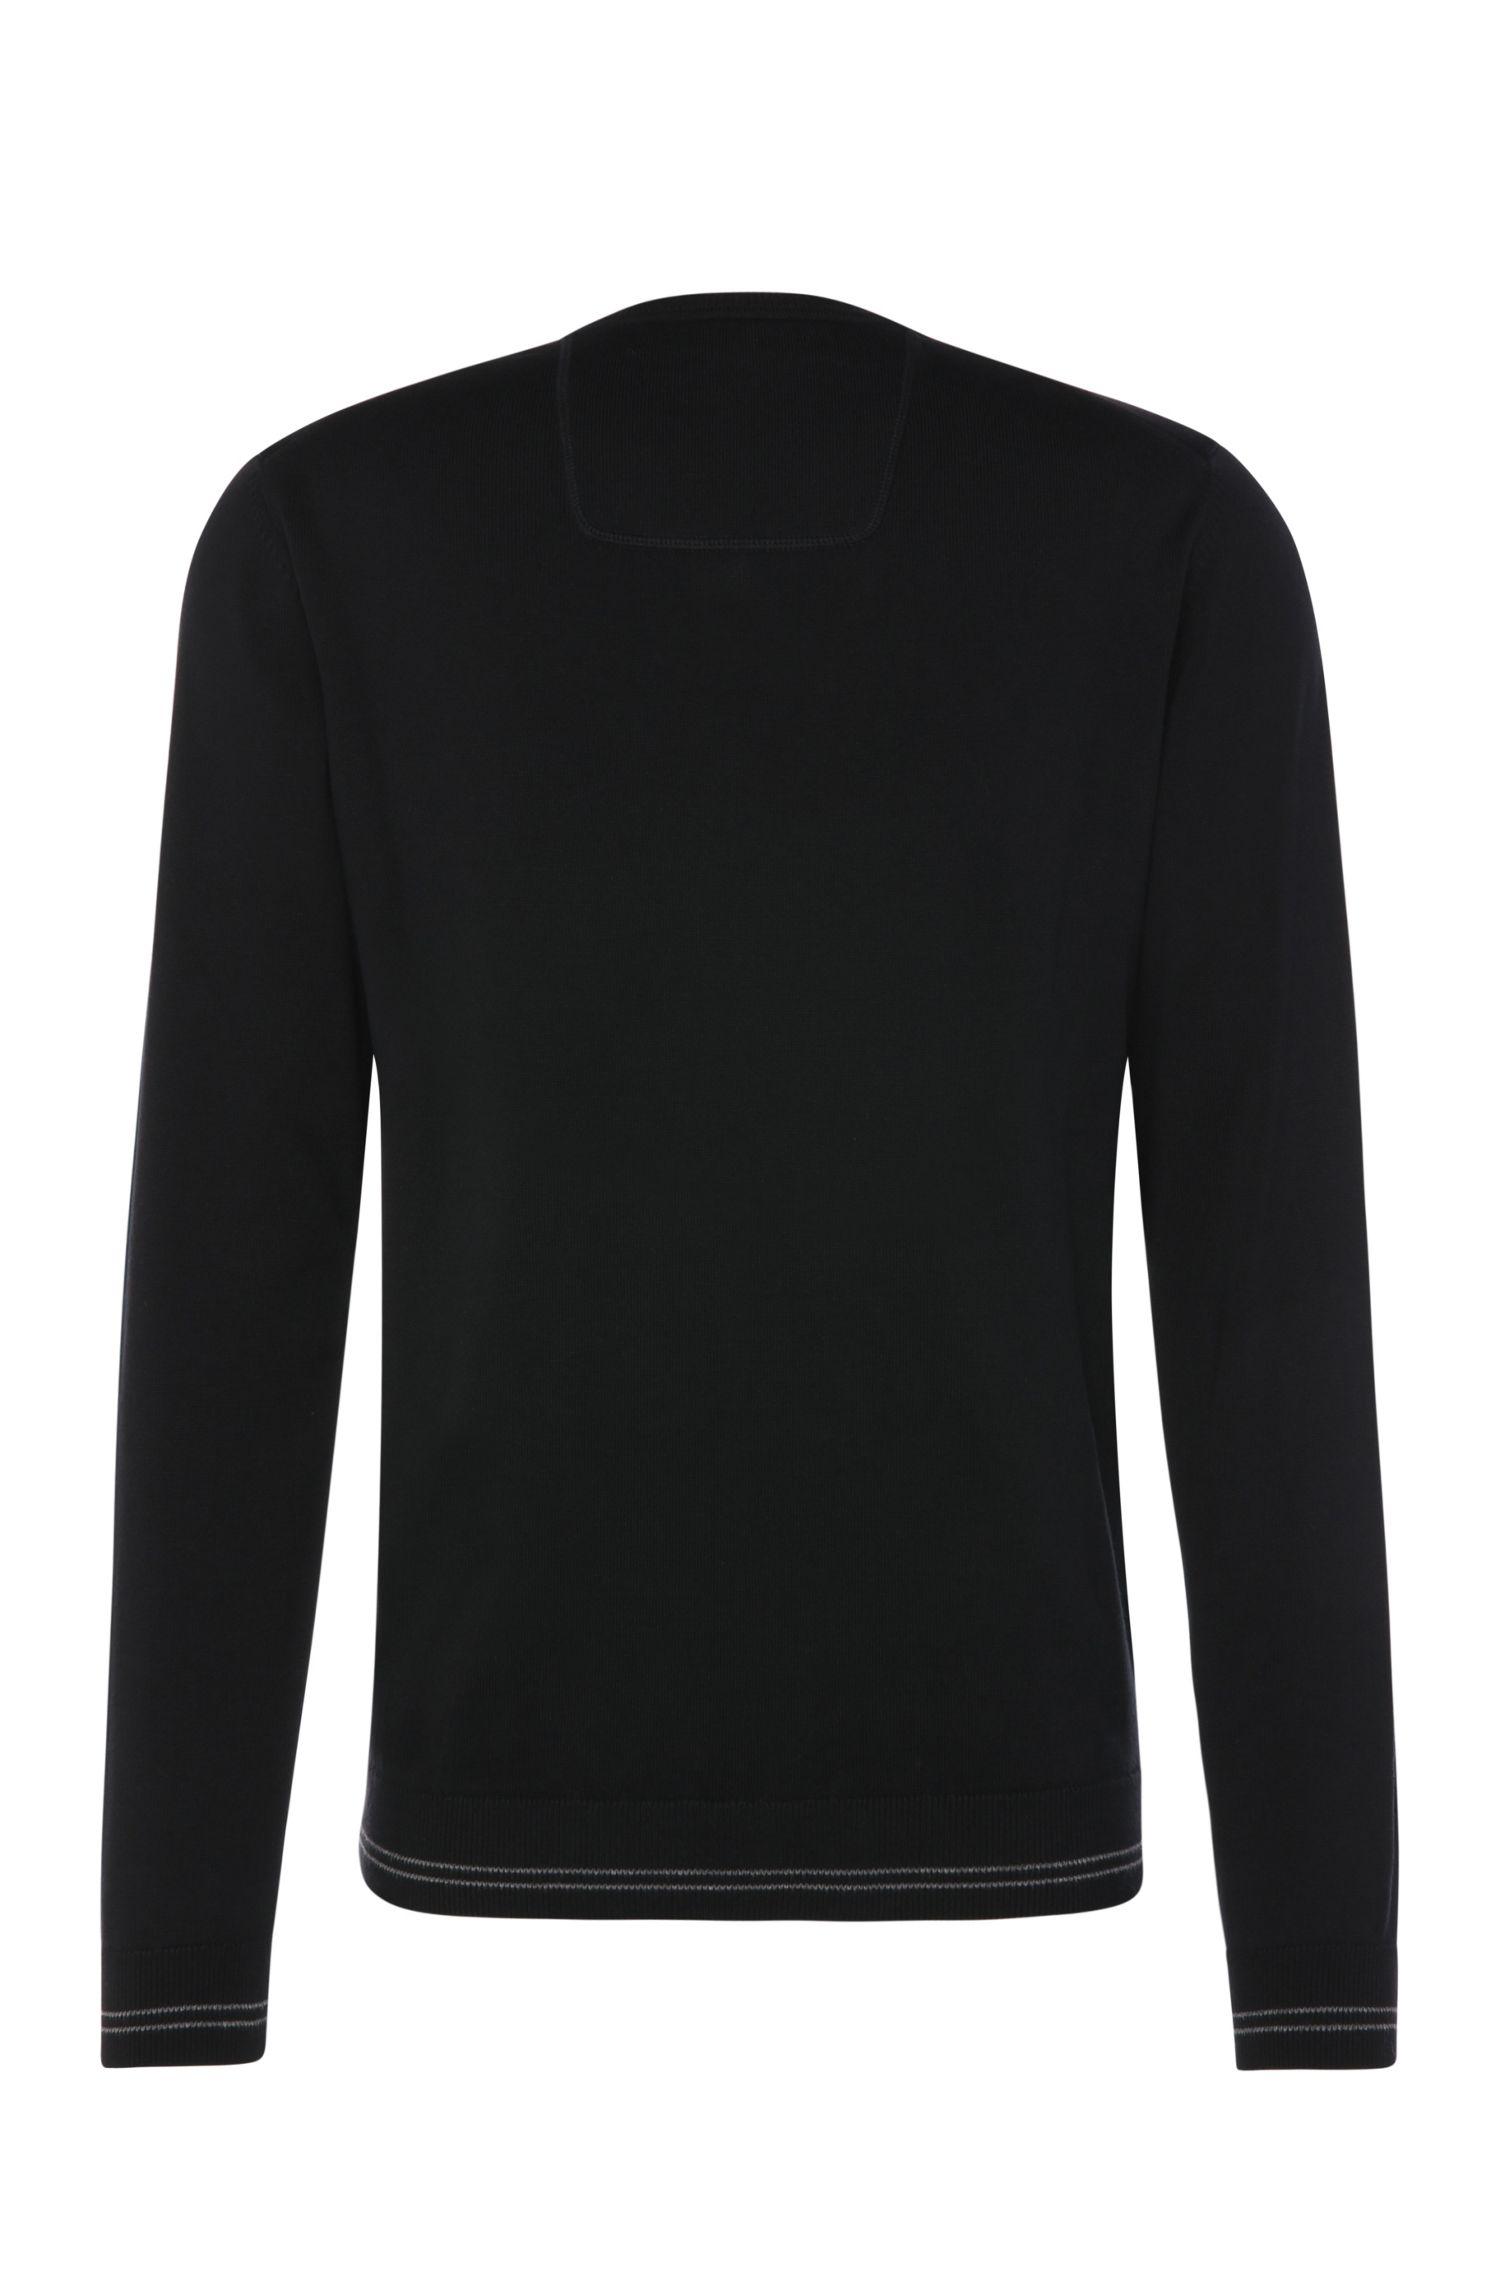 Feinstrick-Pullover mit V-Neck: ´Vime_W16`